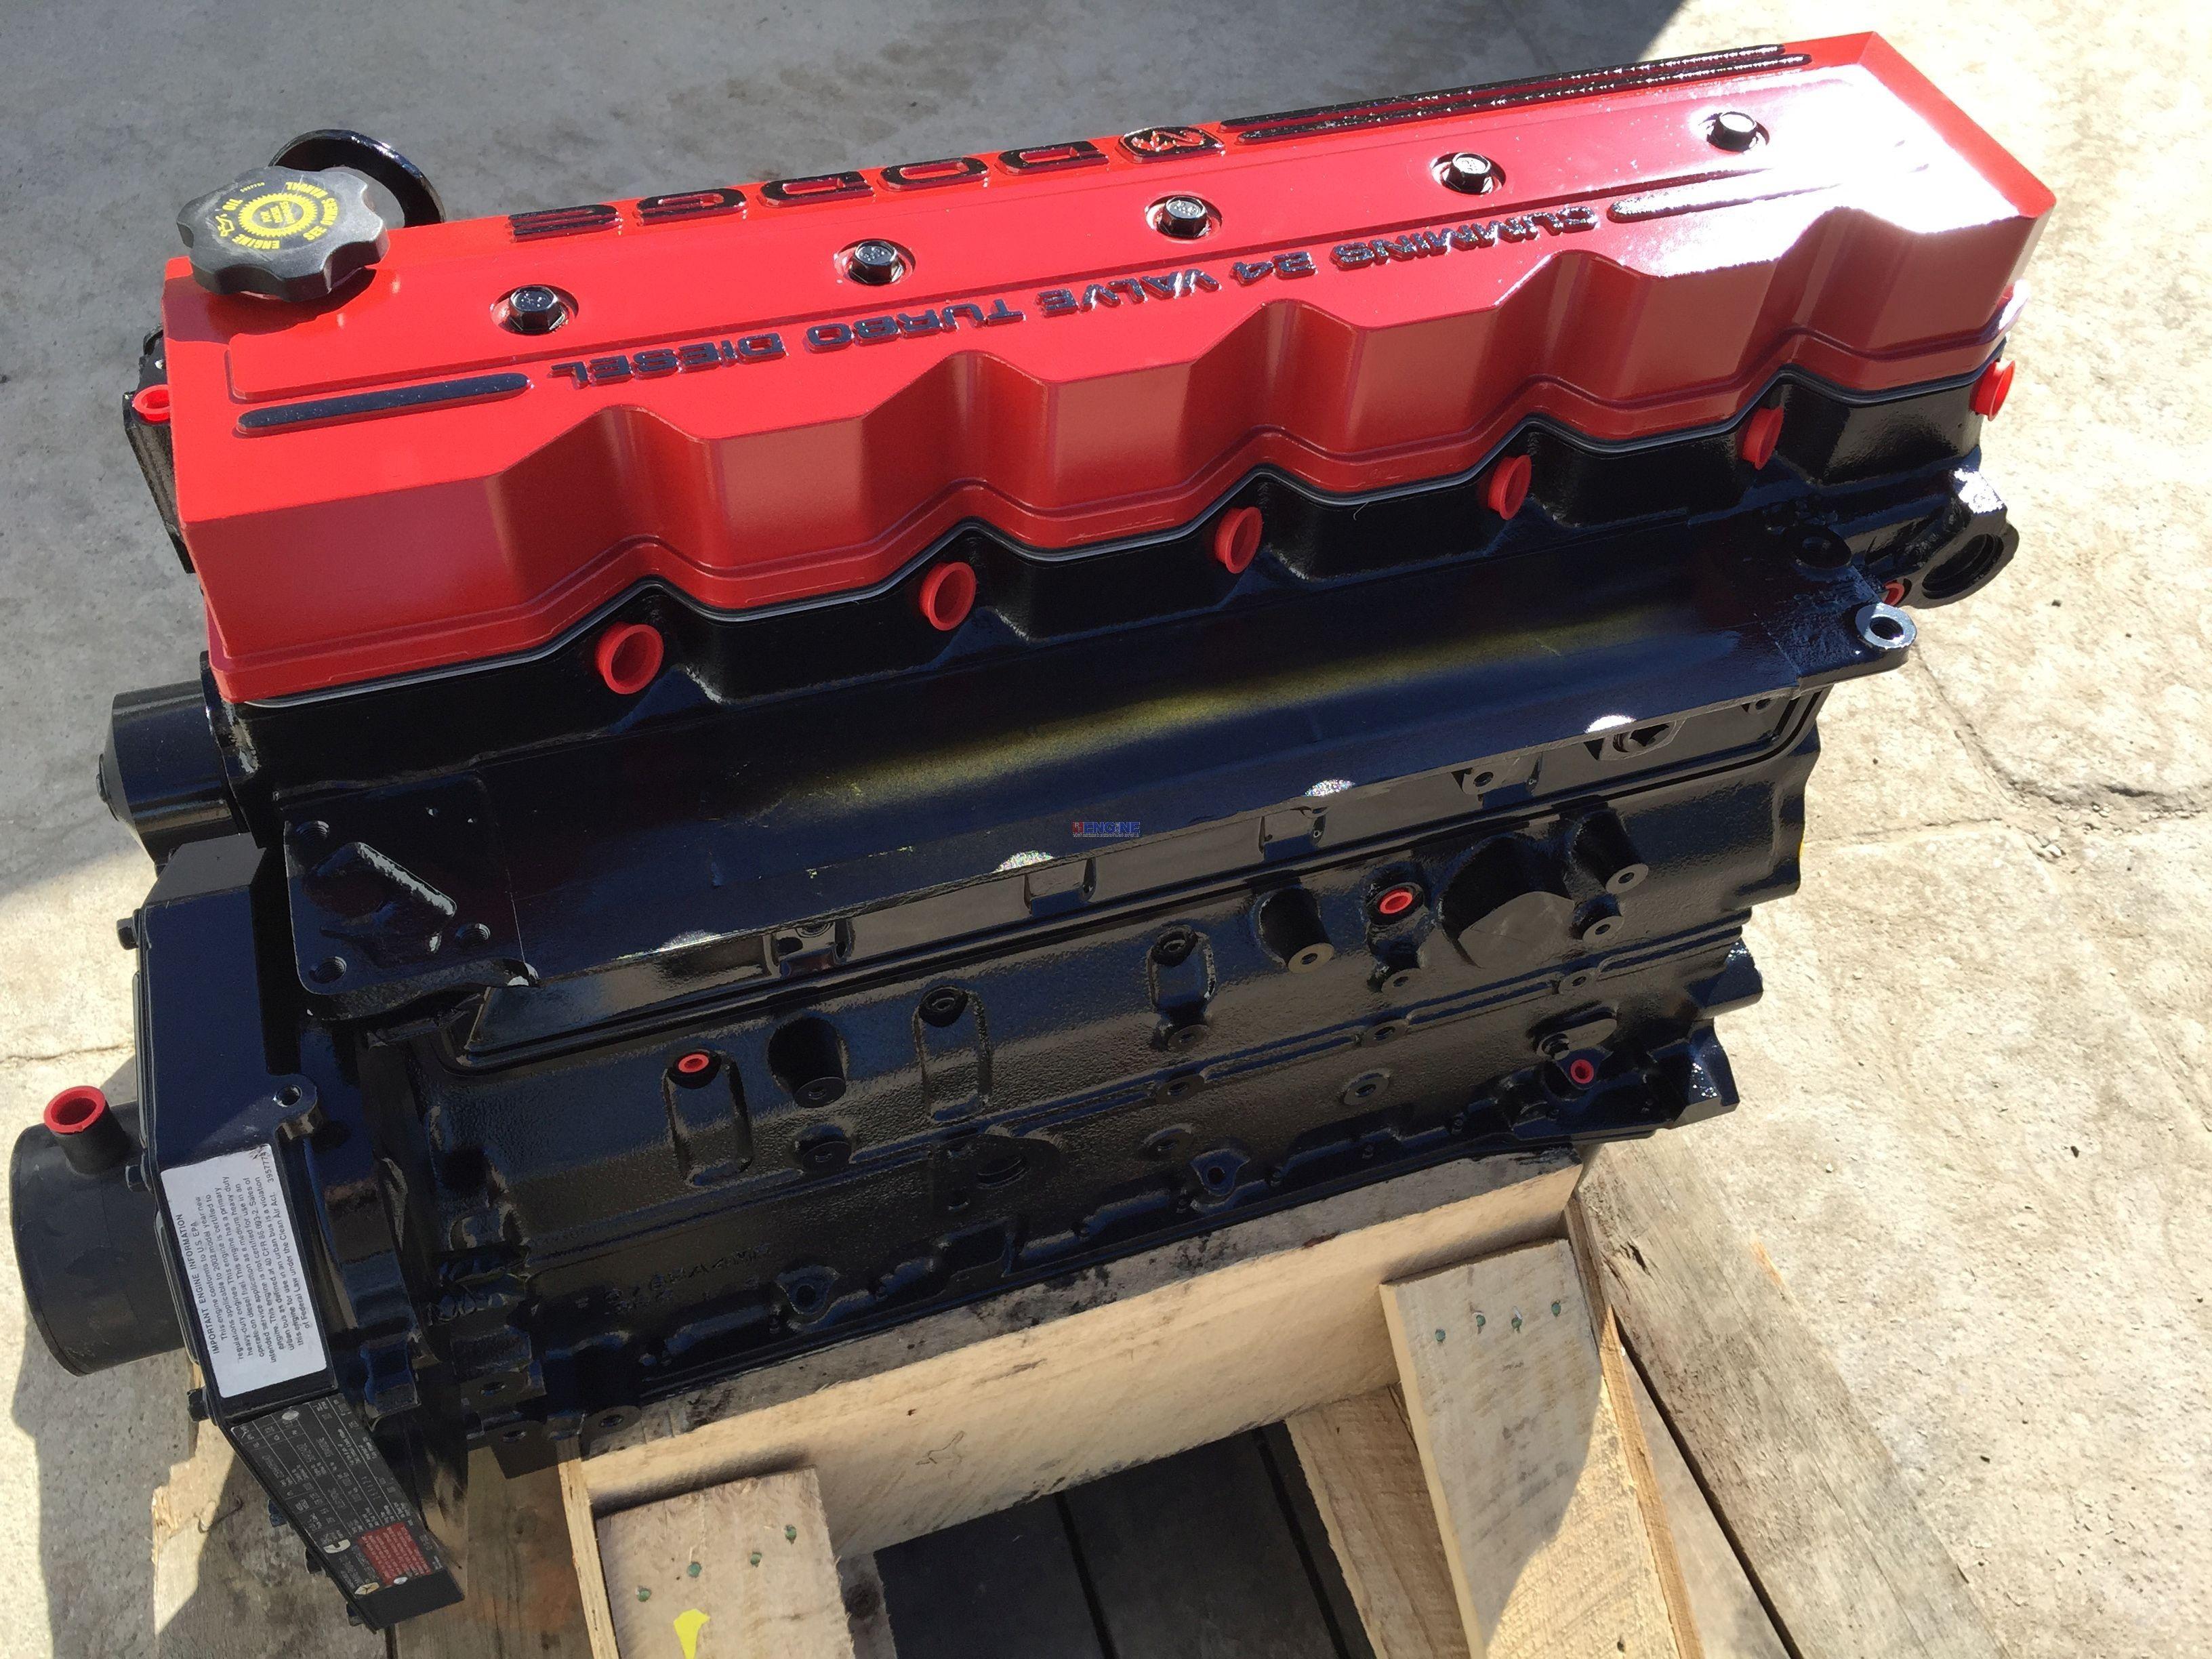 Cummins Dodge 5 9l Engine 24 Valve Cummins Dodge Cummins Gear Drive